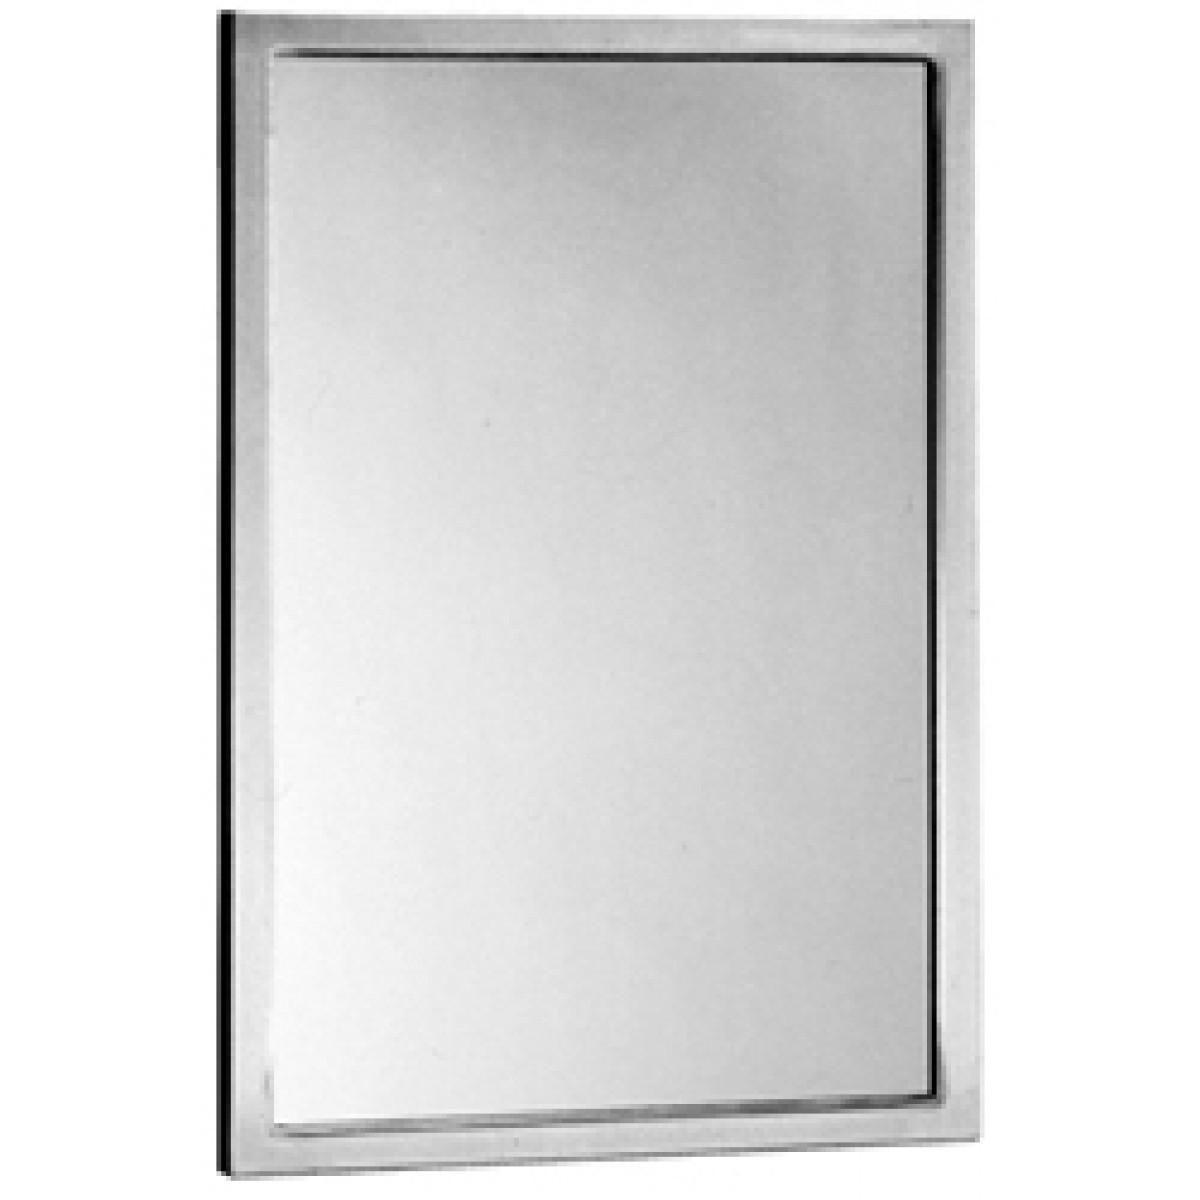 Bathroom mirror 36 x 48 | Bathroom mirrors